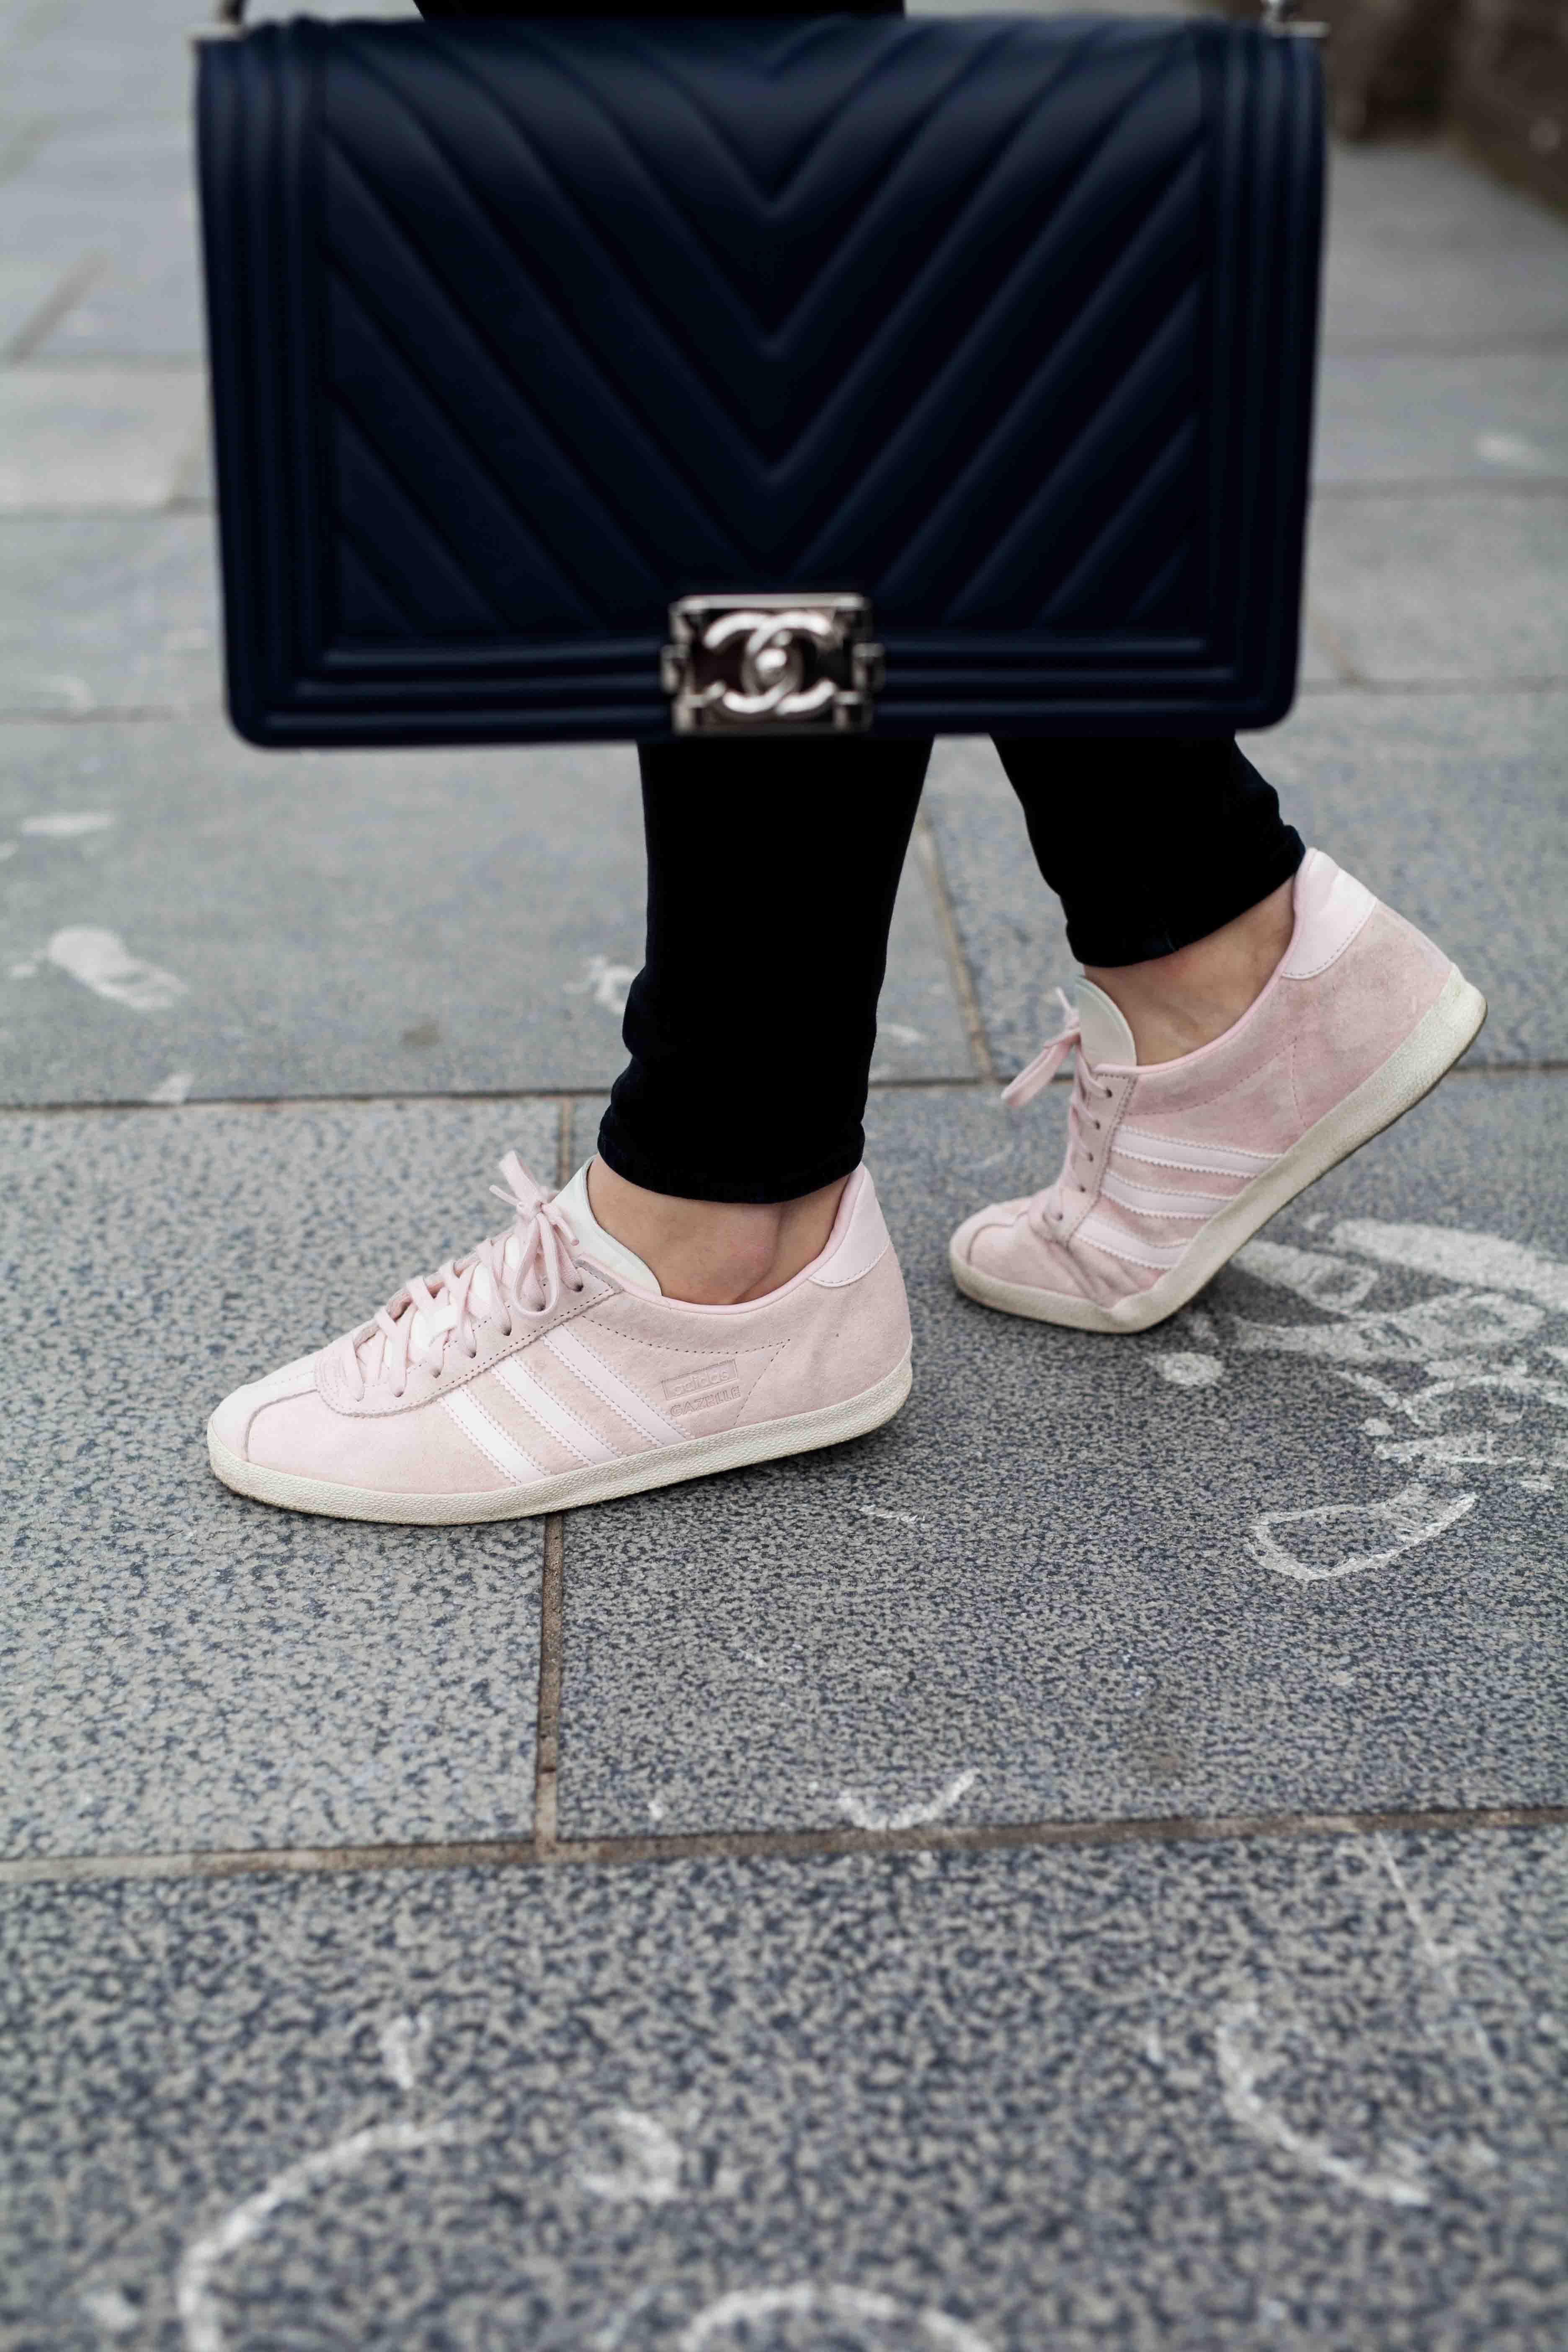 chanel boy bag & gazelle sneakers